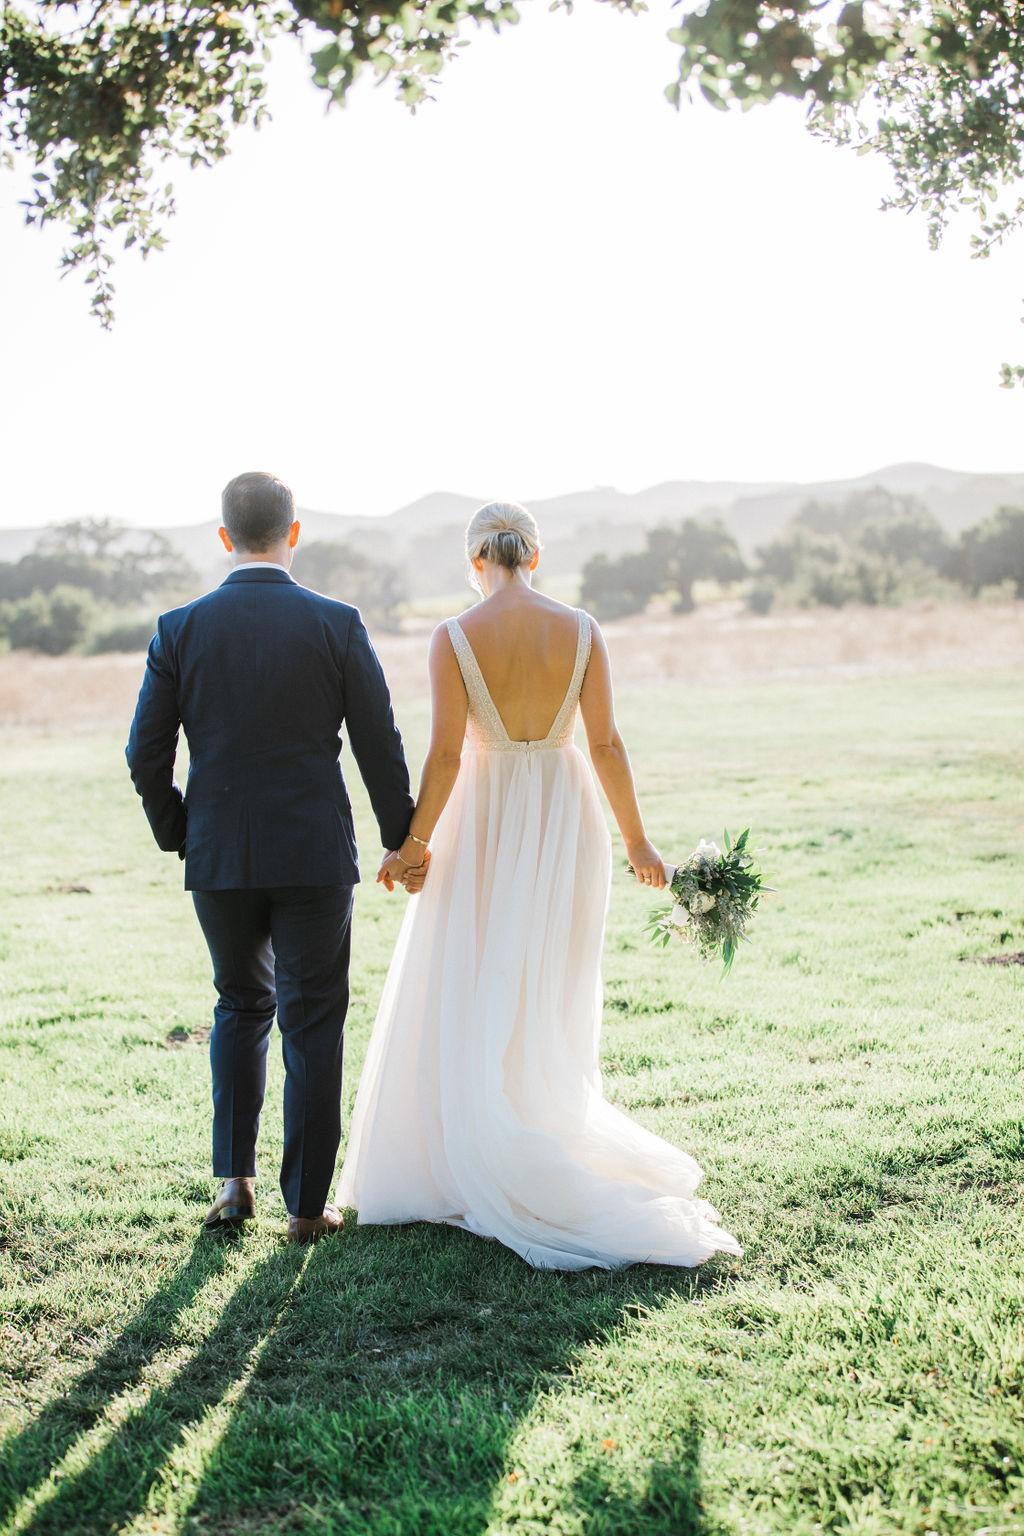 alegria-by-design-wedding-planner-planning-event-design-coordinator-day-of-month-crossroads-estate-garden-vineyard-firestone-barn-location-rustic-santa-barbara (1 (12).JPG